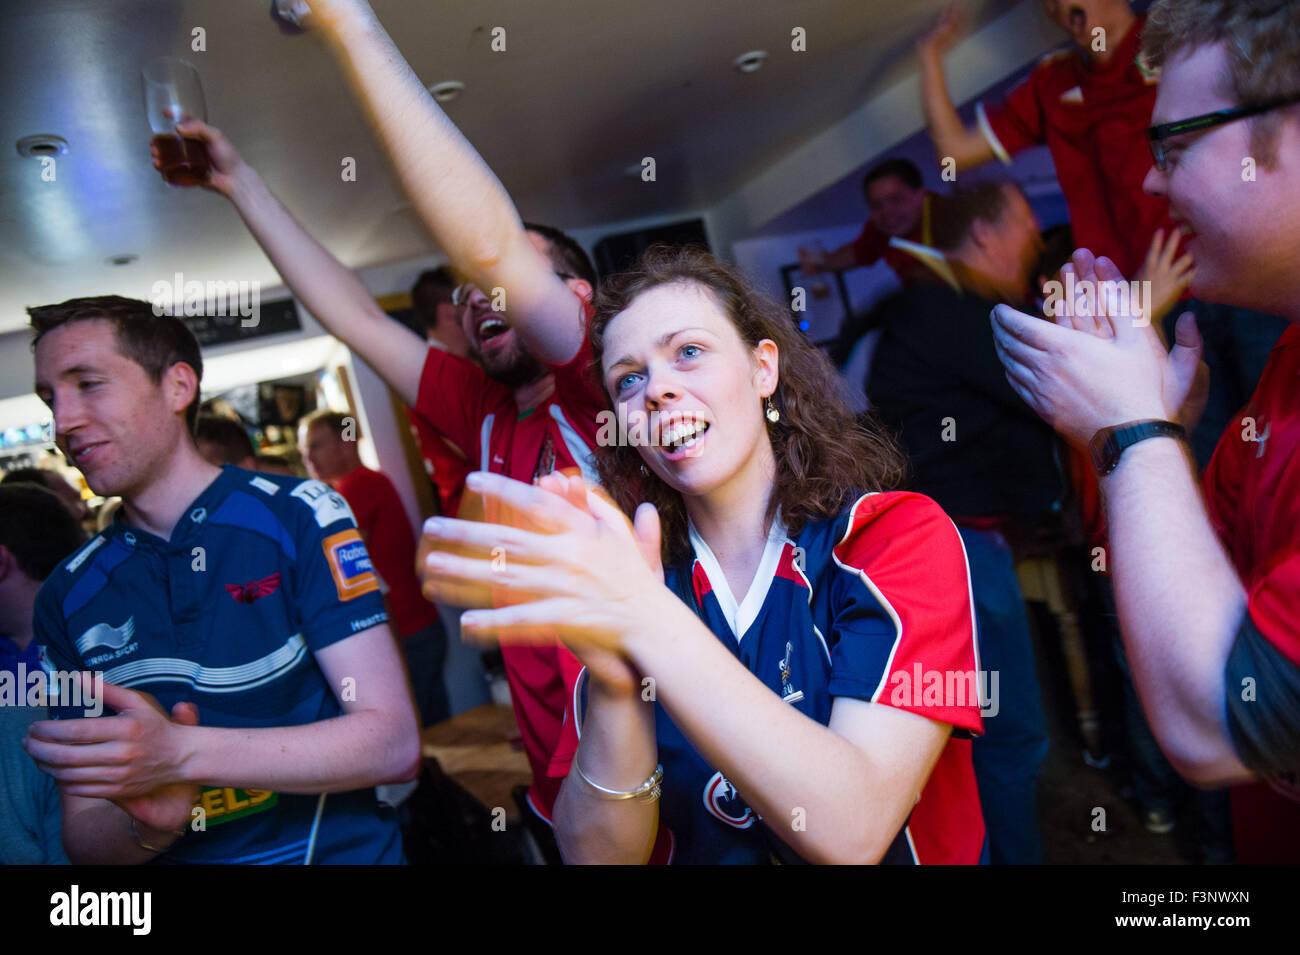 Aberystwyth Wales Uk, Saturday 10 October 2015  Welsh football  fans in the Llew Du pub  Hotel in Aberystwyth celebrate - Stock Image